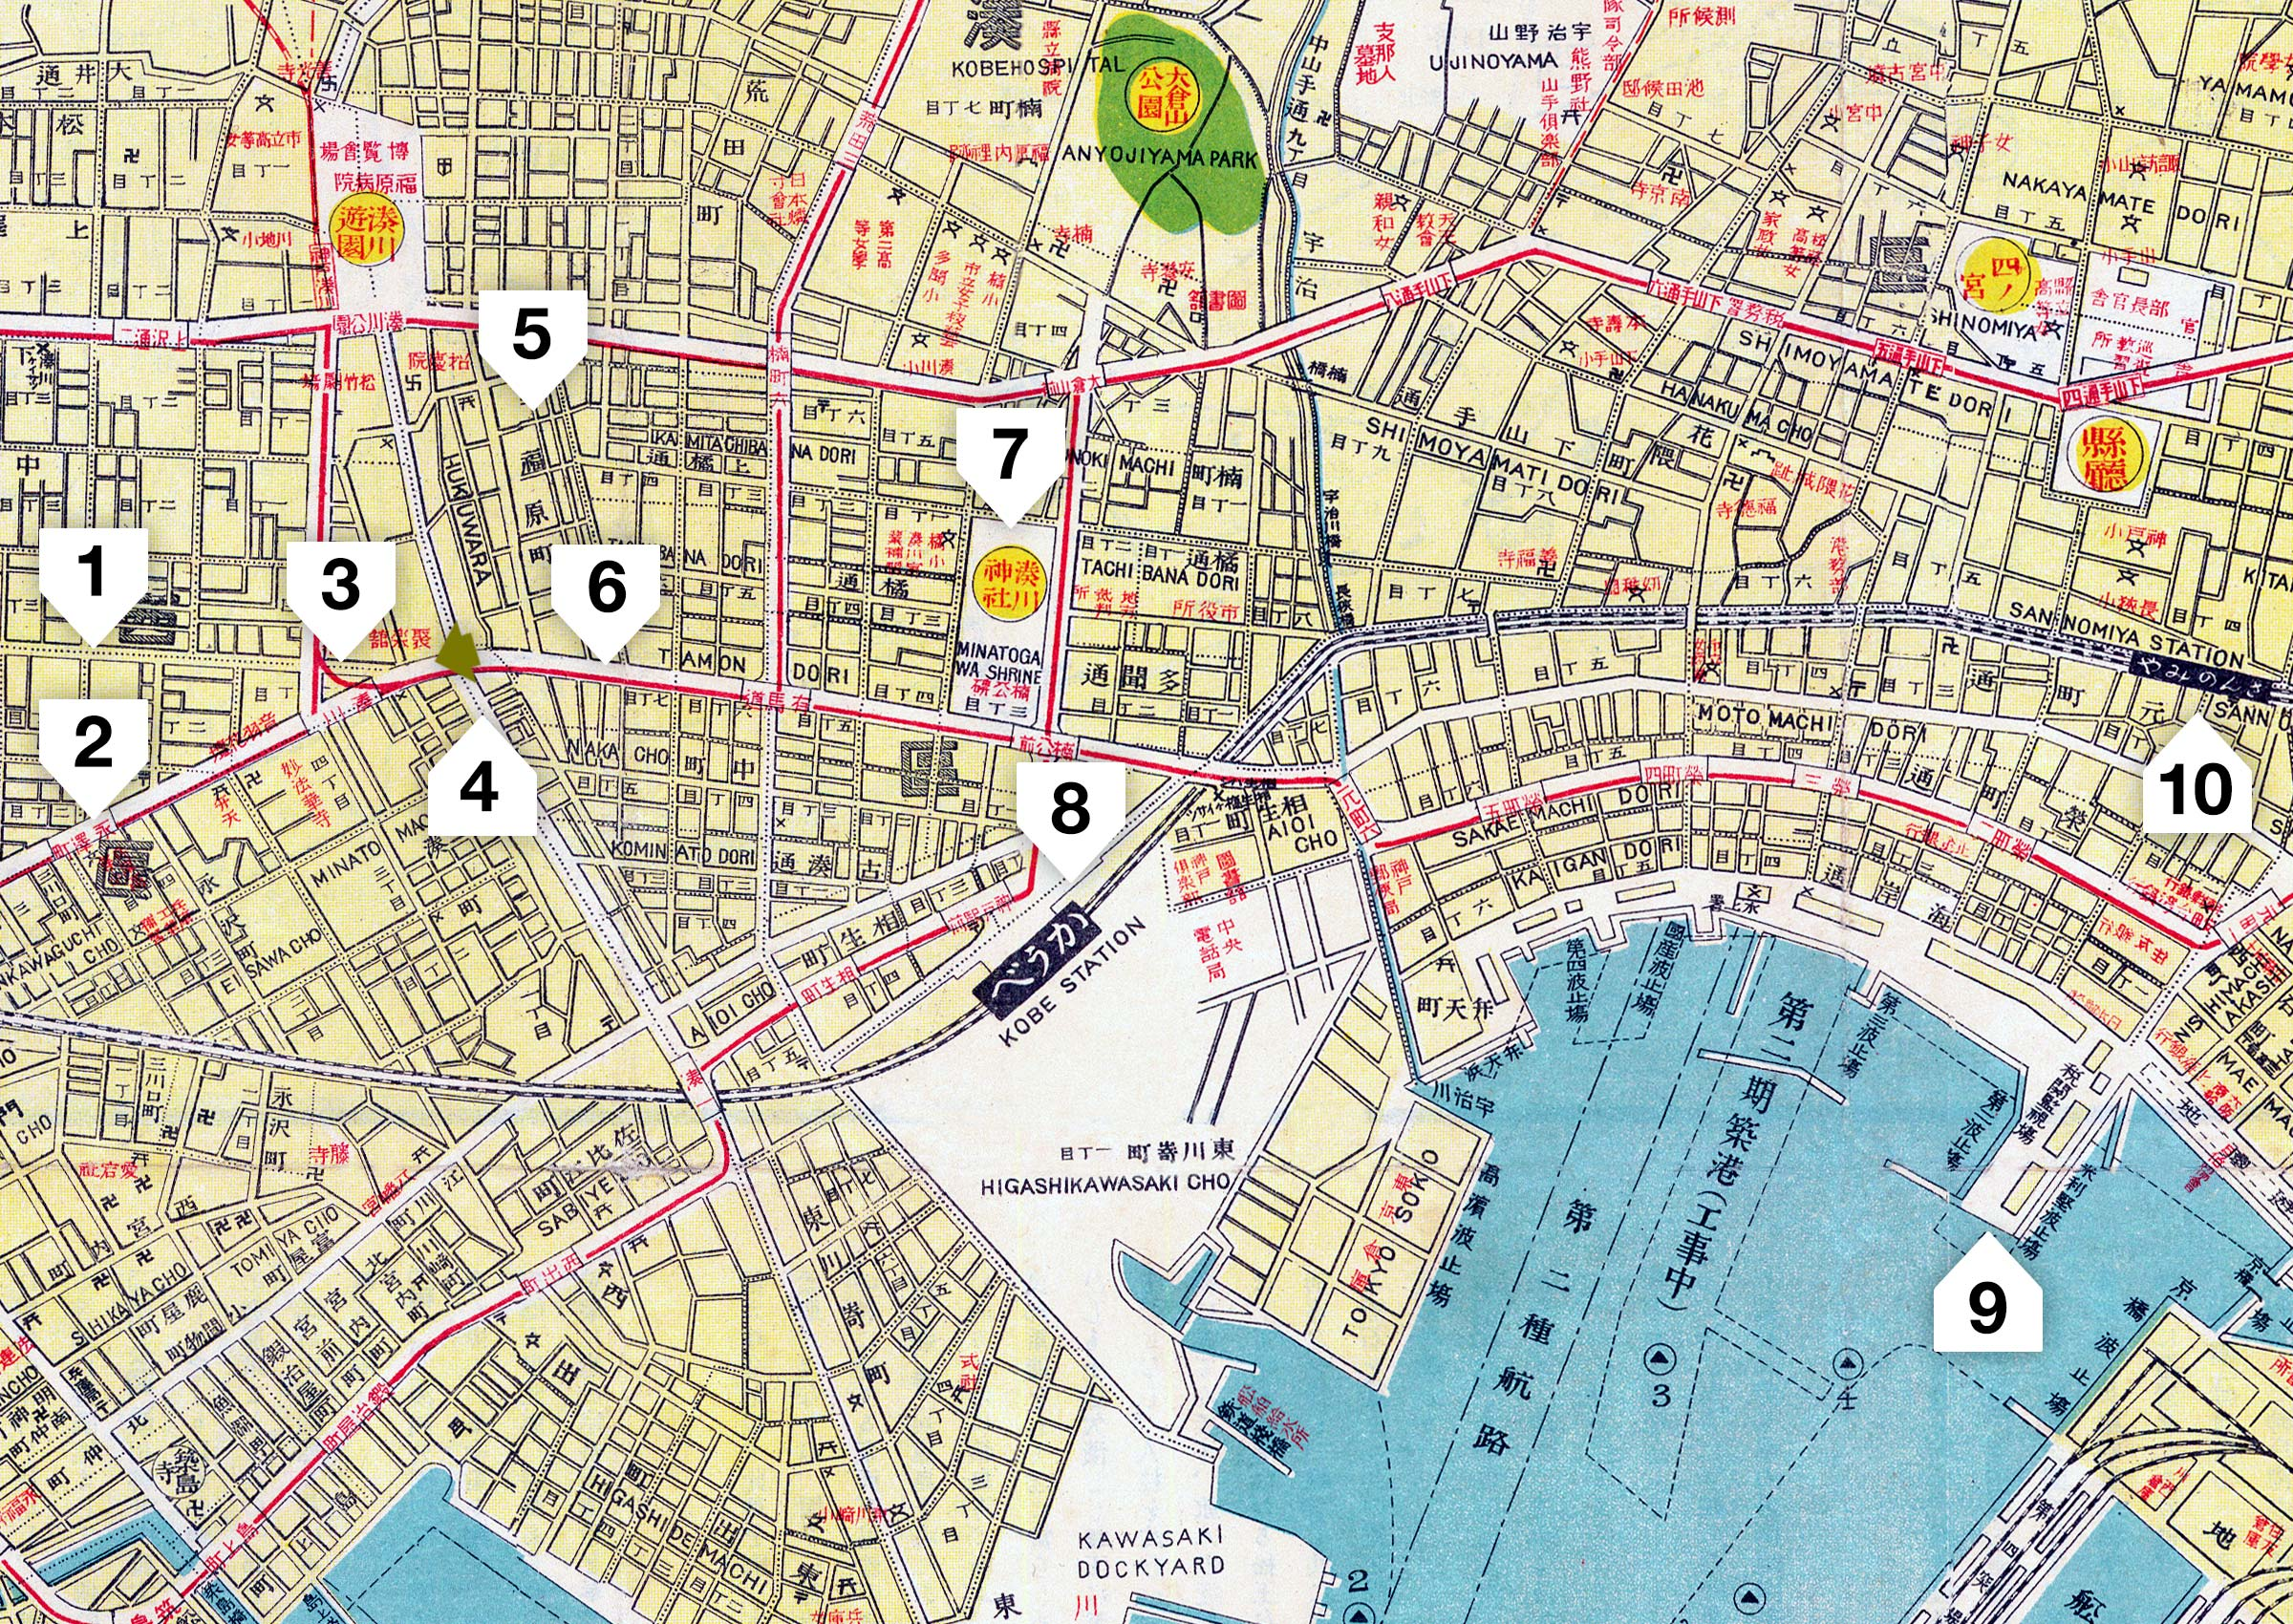 Map of Kobe, 1937